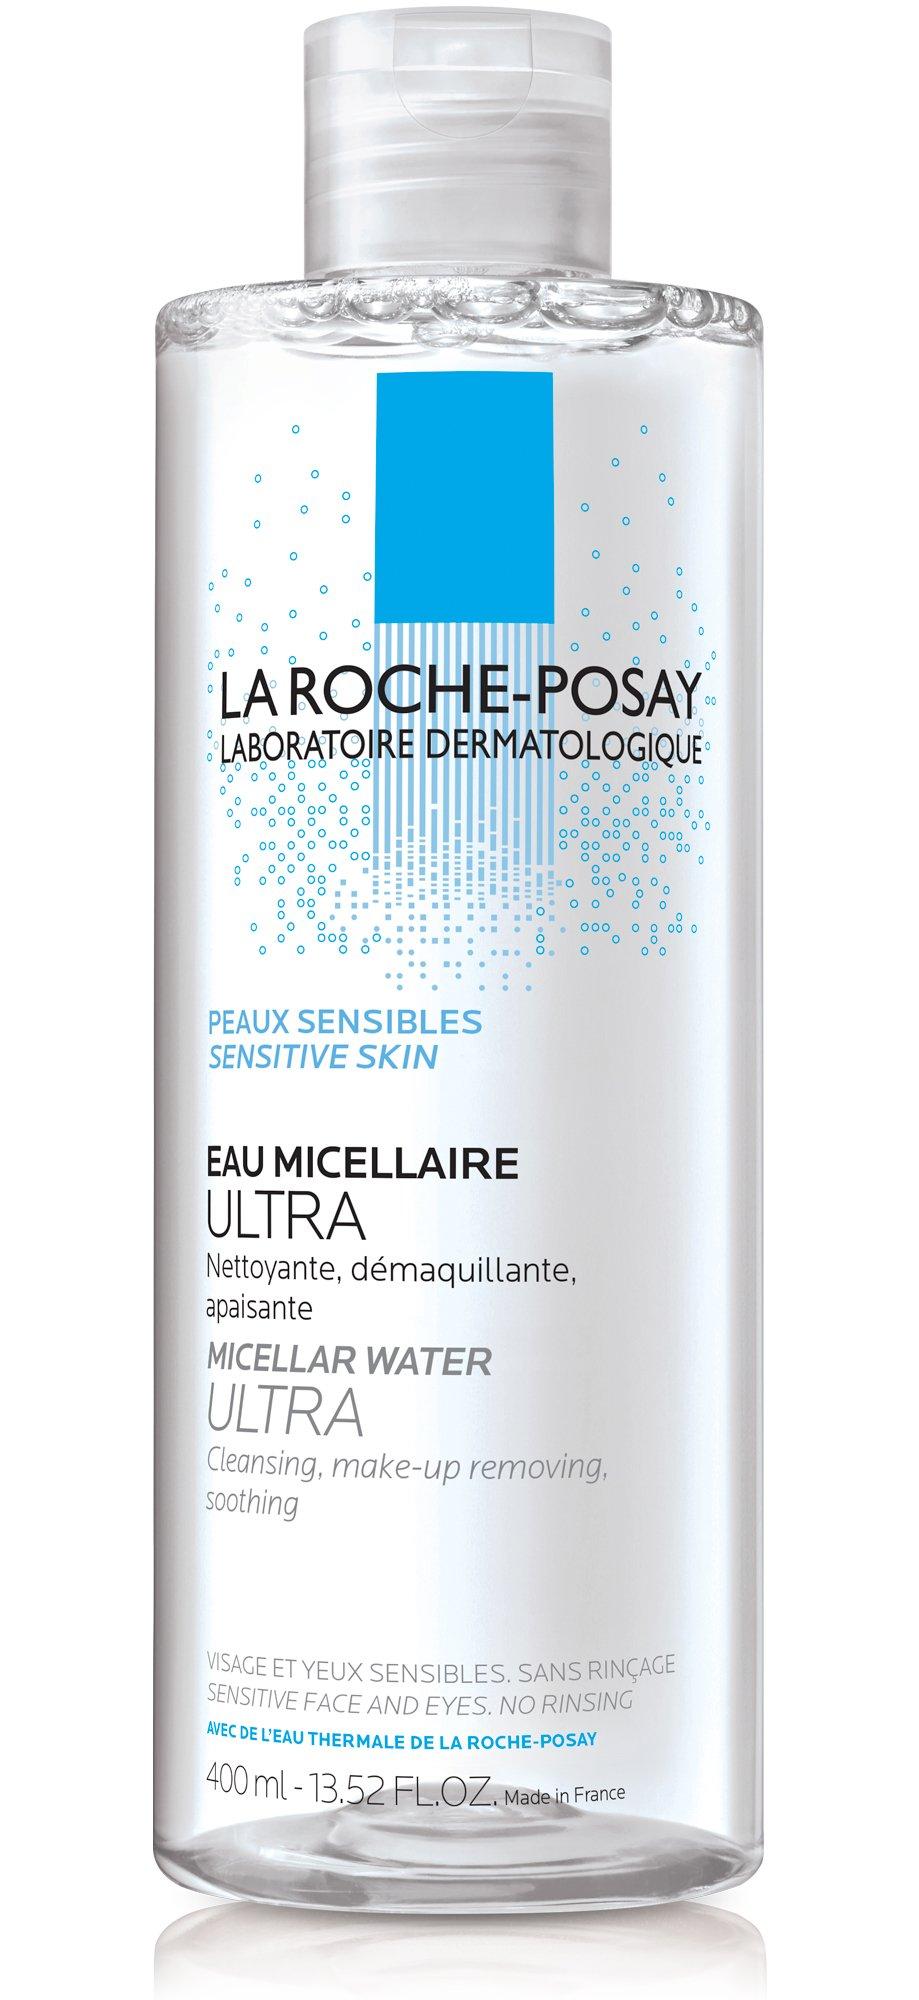 La Roche-Posay Micellar Cleansing Water for Sensitive Skin, 13.5 Fl. Oz. by La Roche-Posay